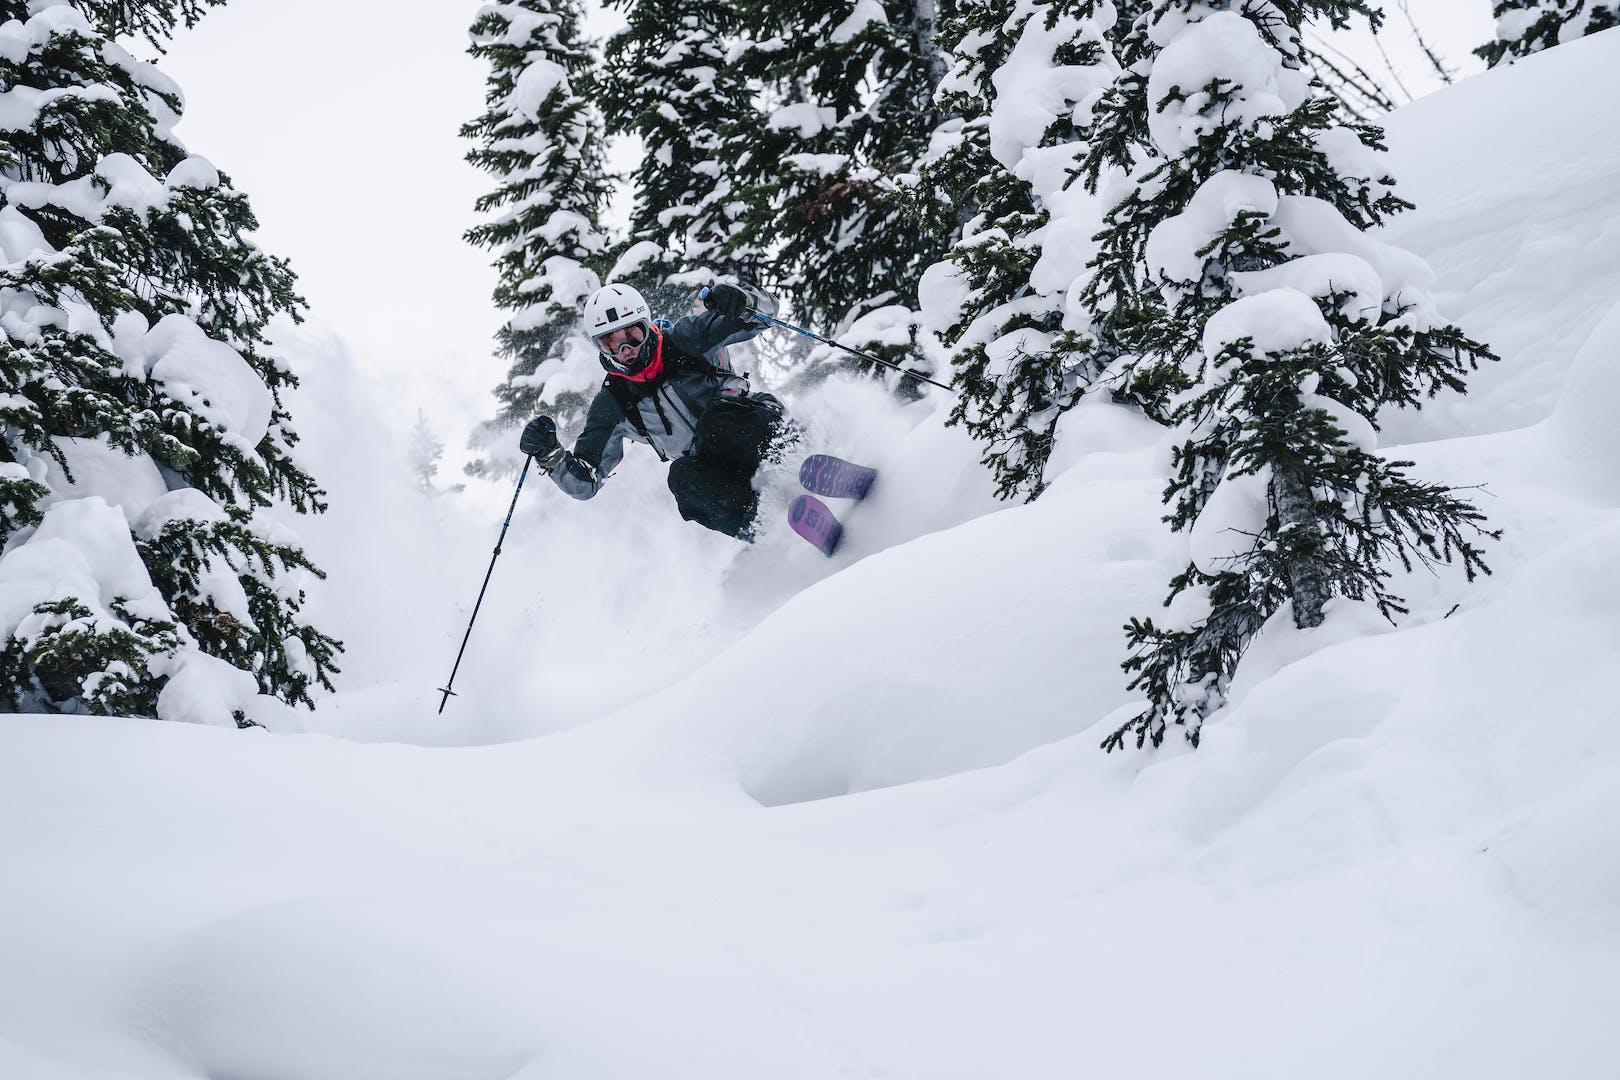 Isaac Freeland skiing deep powder in the backcountry